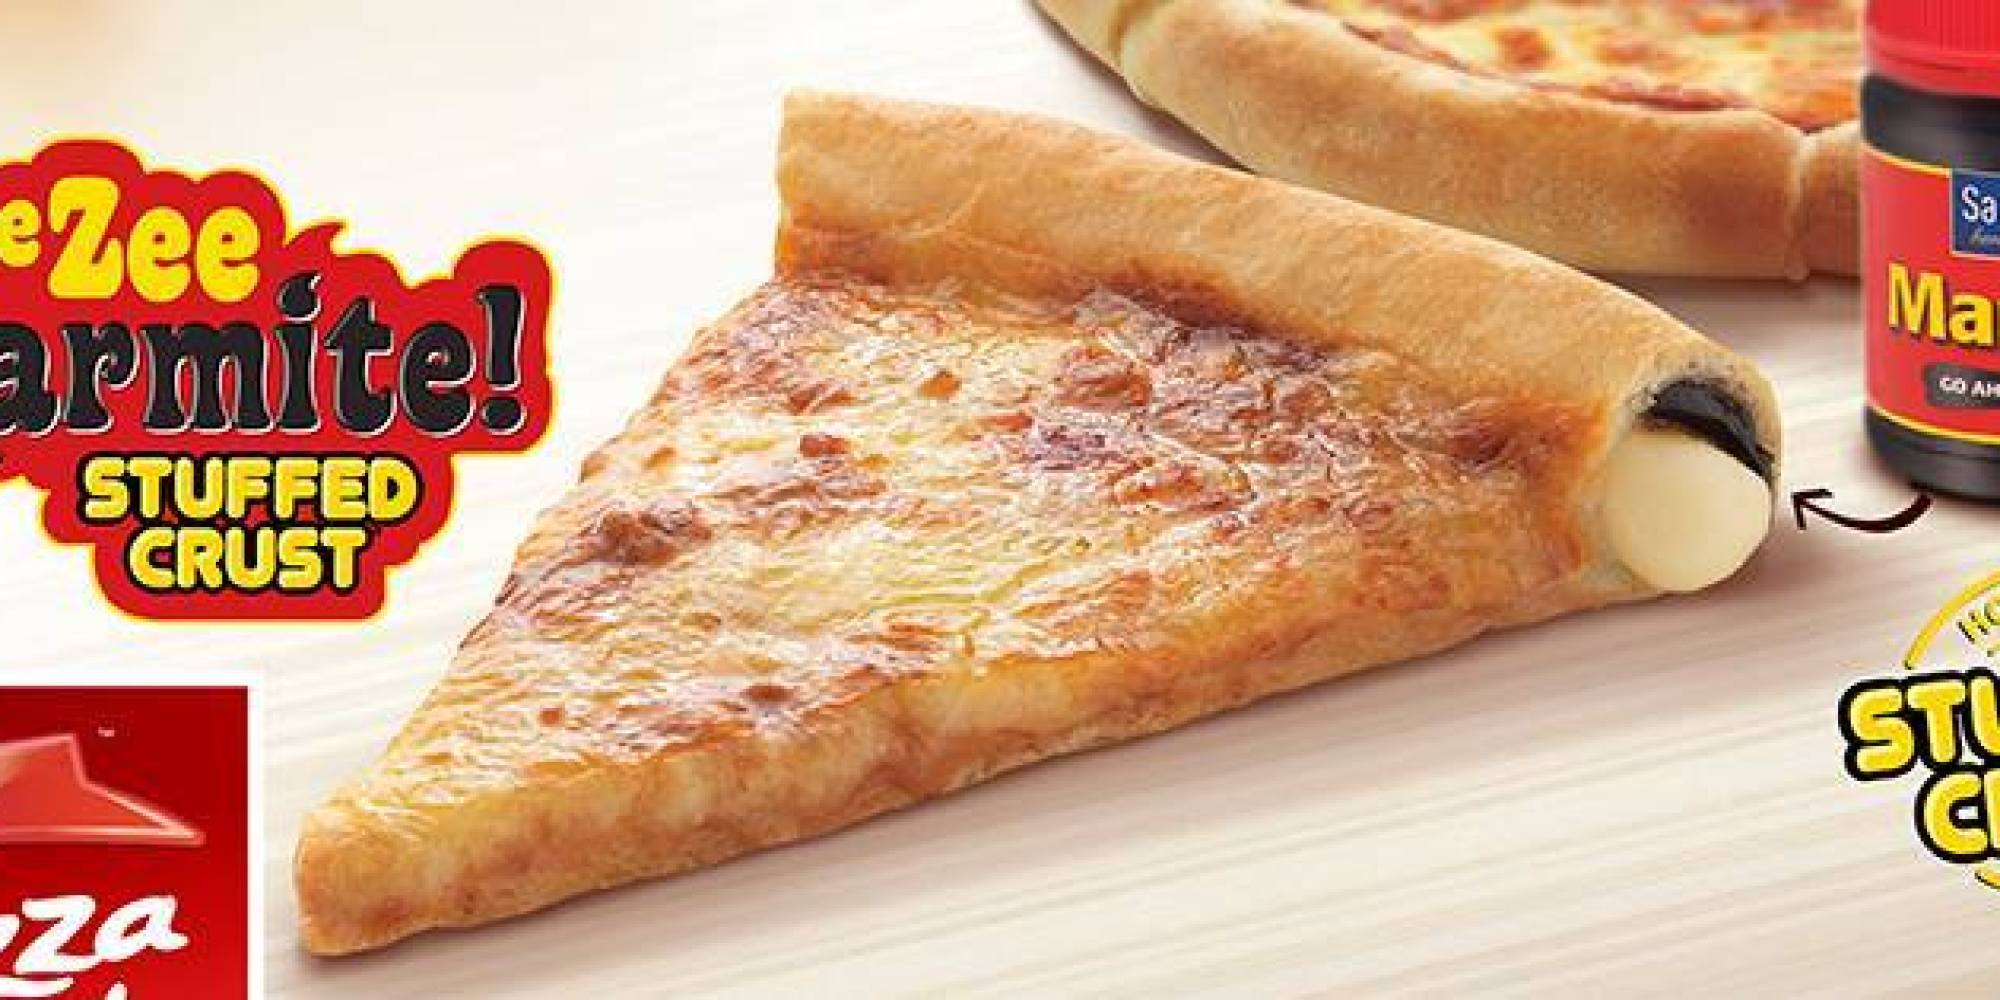 Current pizza hut coupons nz